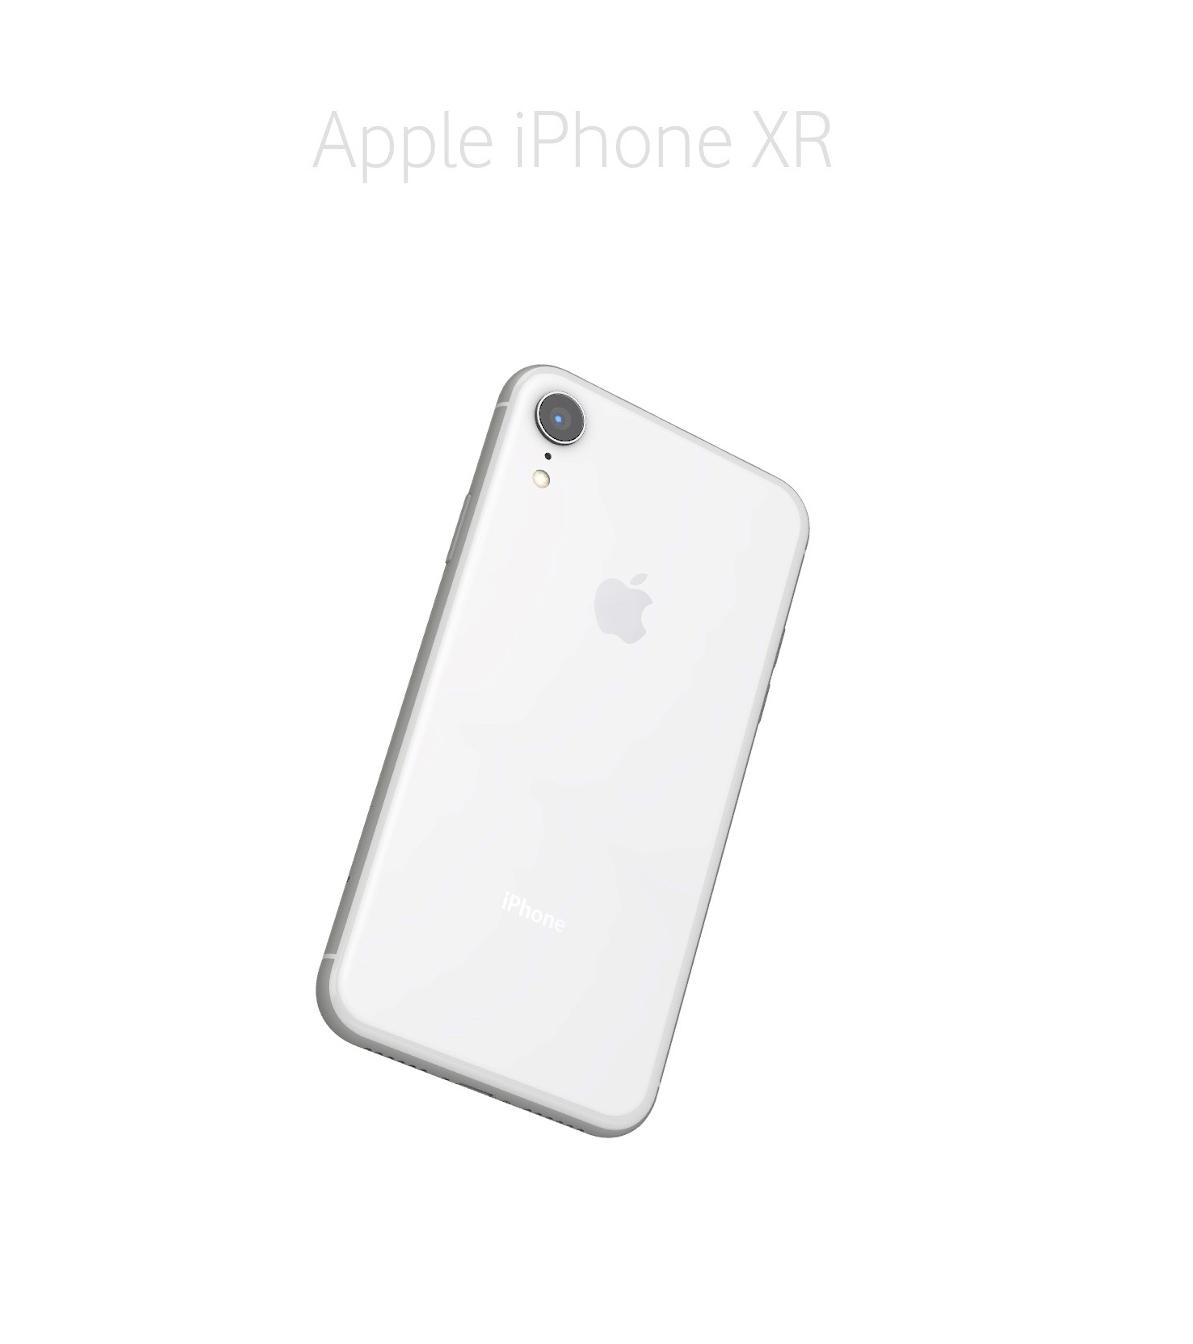 Laga glas/baksida iPhone XR